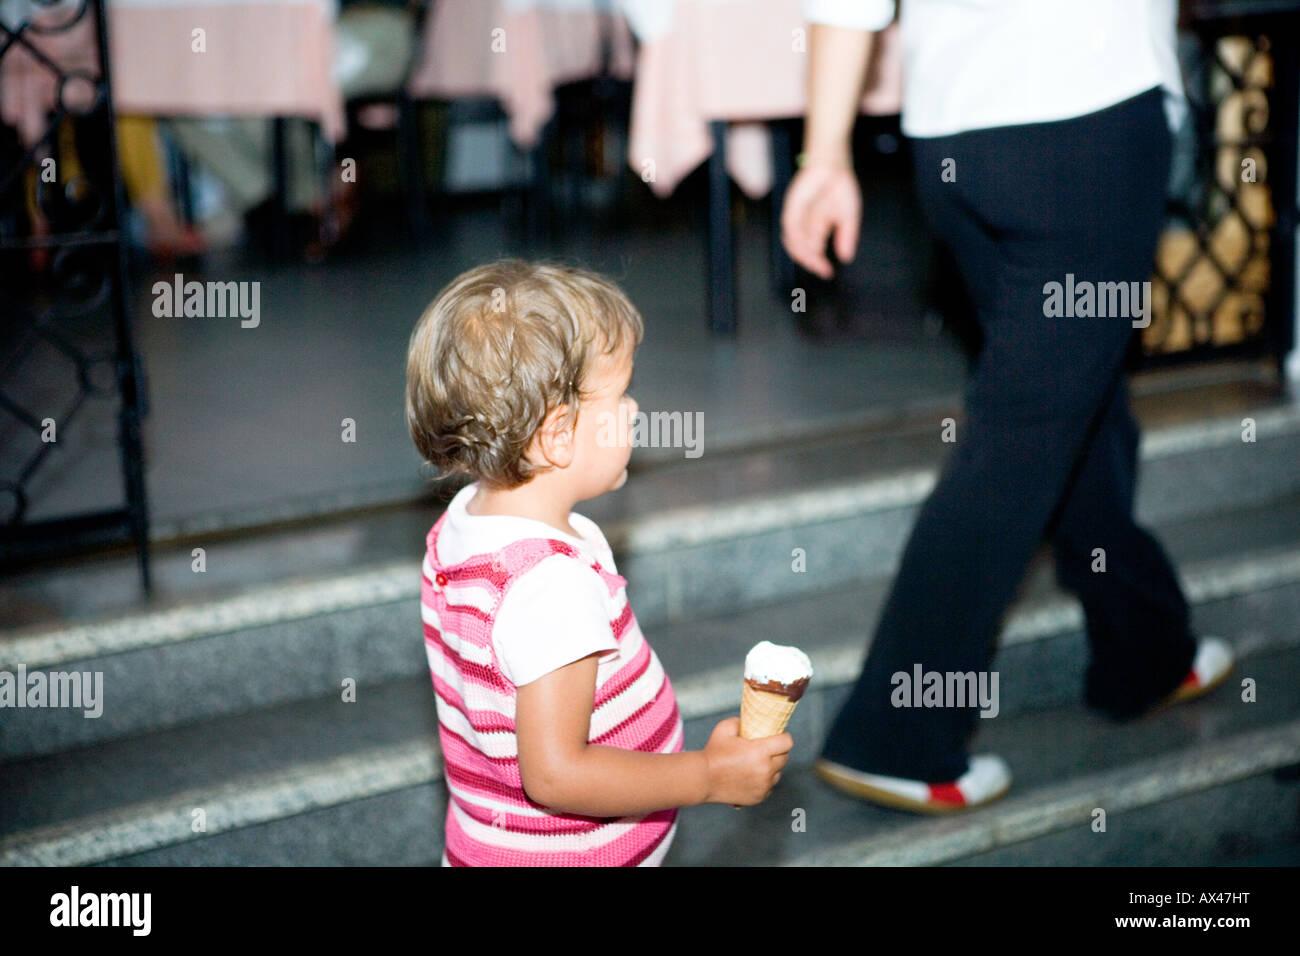 little child with icecream - Stock Image